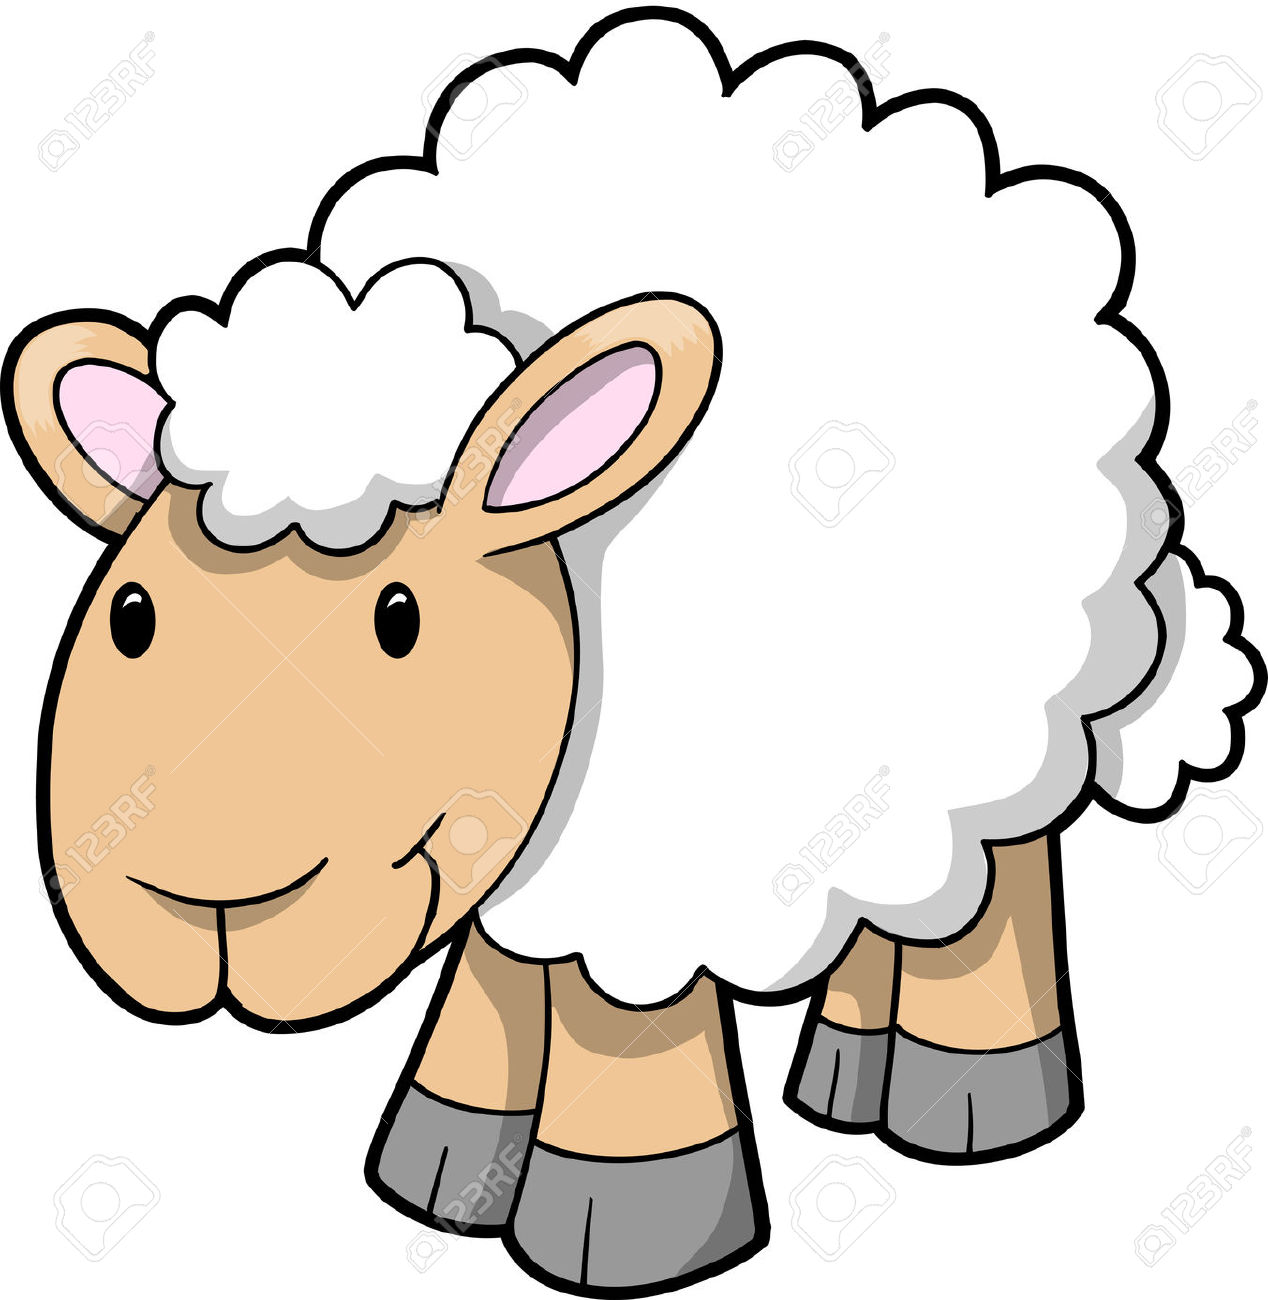 1268x1300 Captivating Sheep Clip Art Top 74 Clipart Free Image